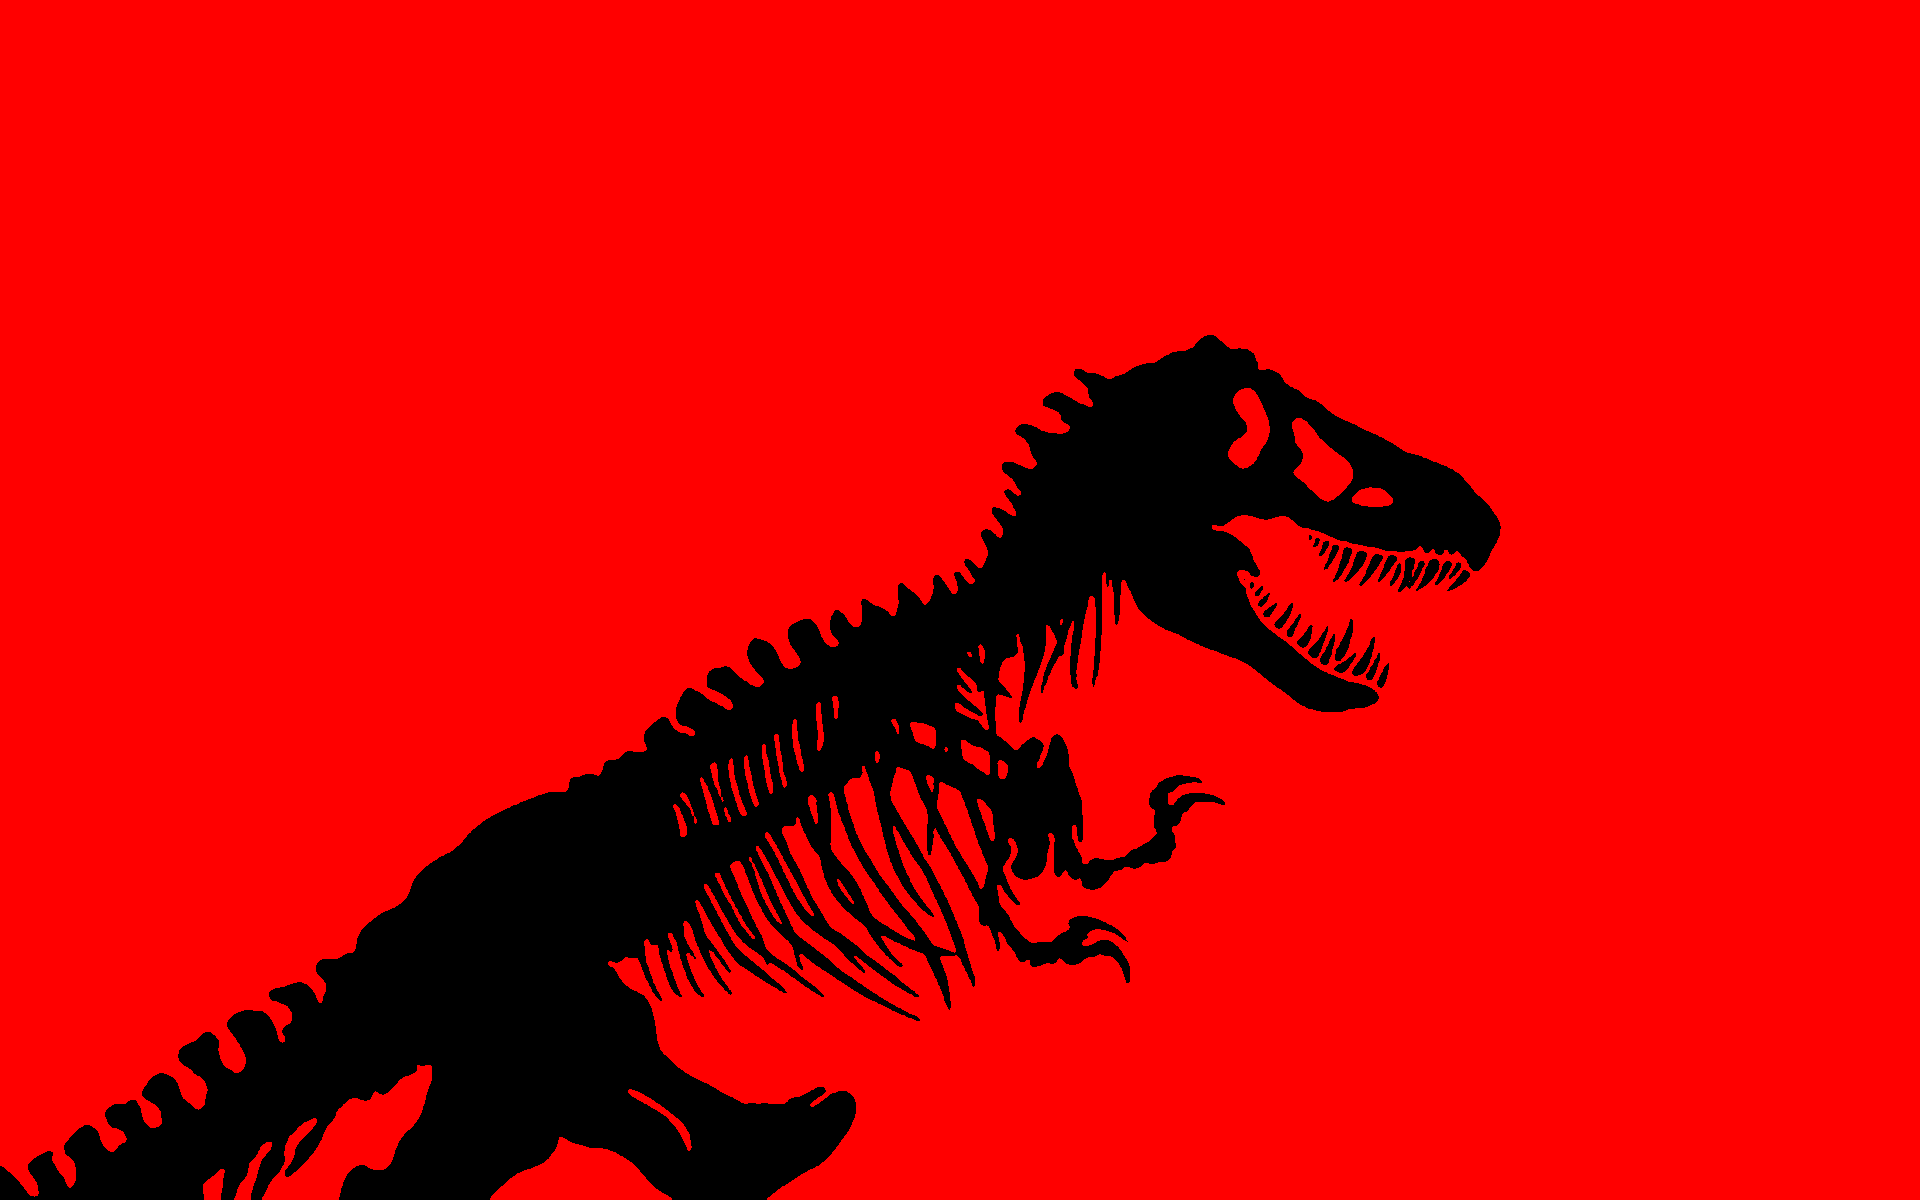 Red Dinosaurs Jurassic Park Tyrannosaurus Rex Simple